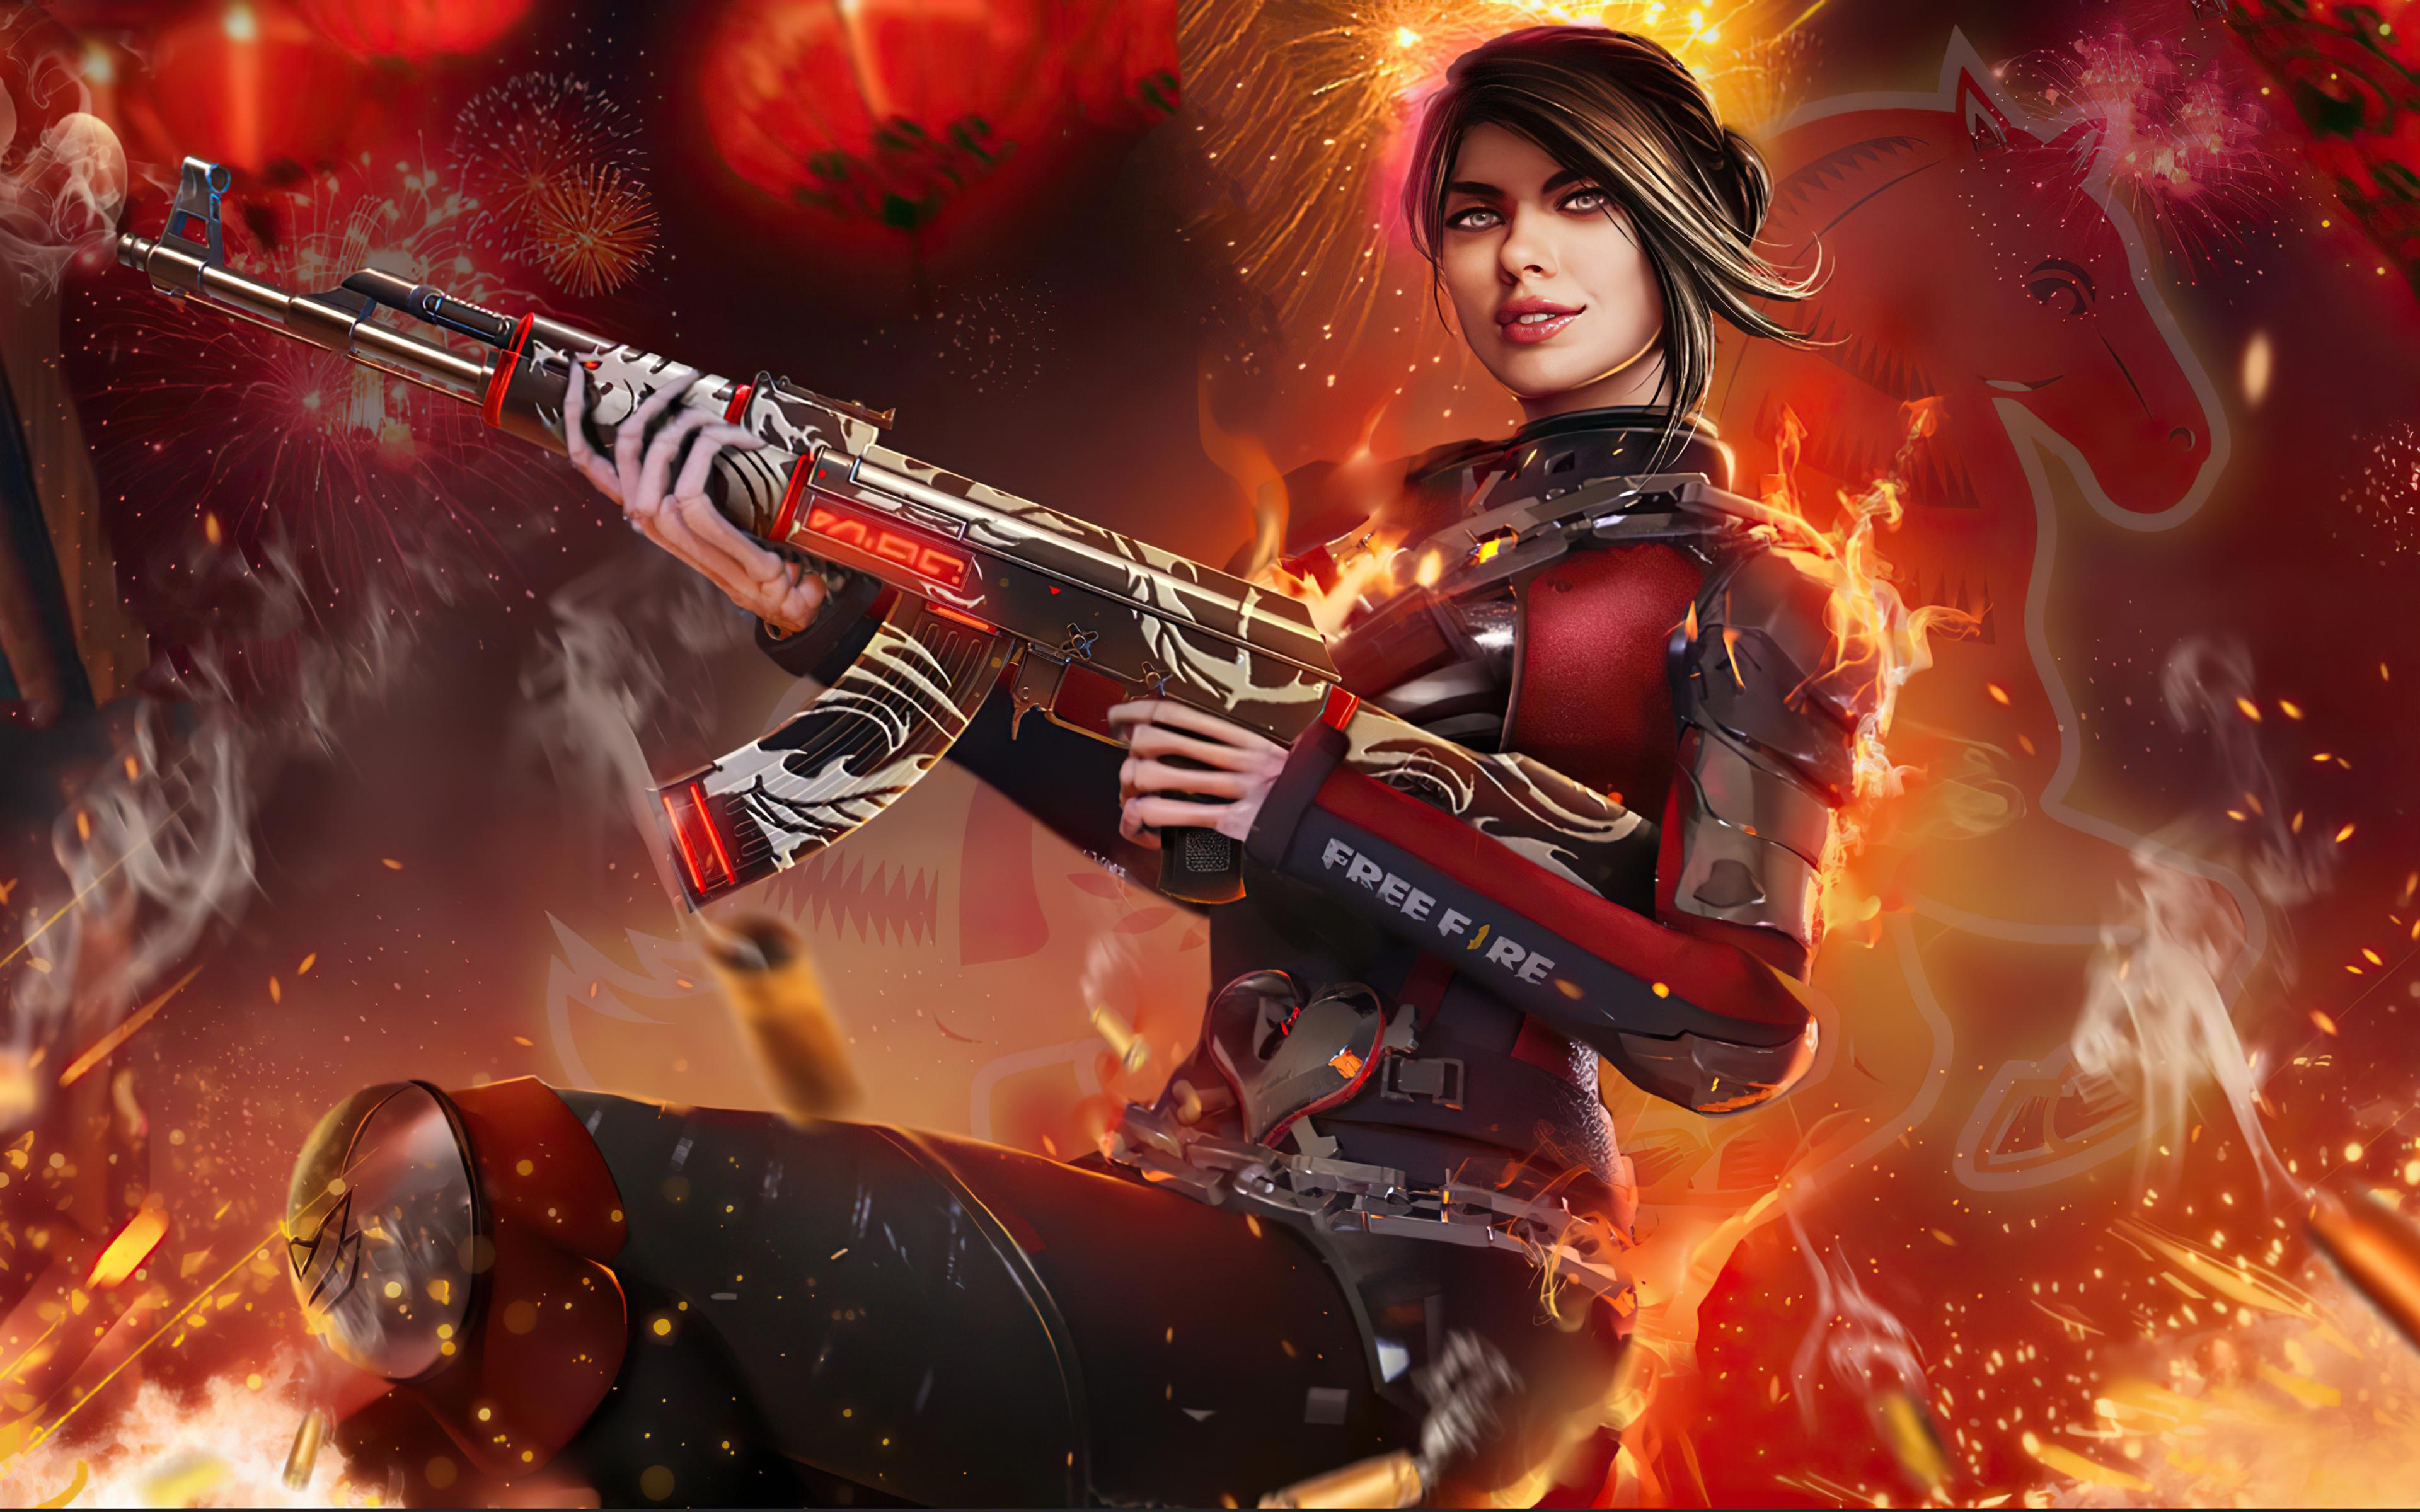 3840x2400 Garena Free Fire 4k Game 2020 4k HD 4k ...